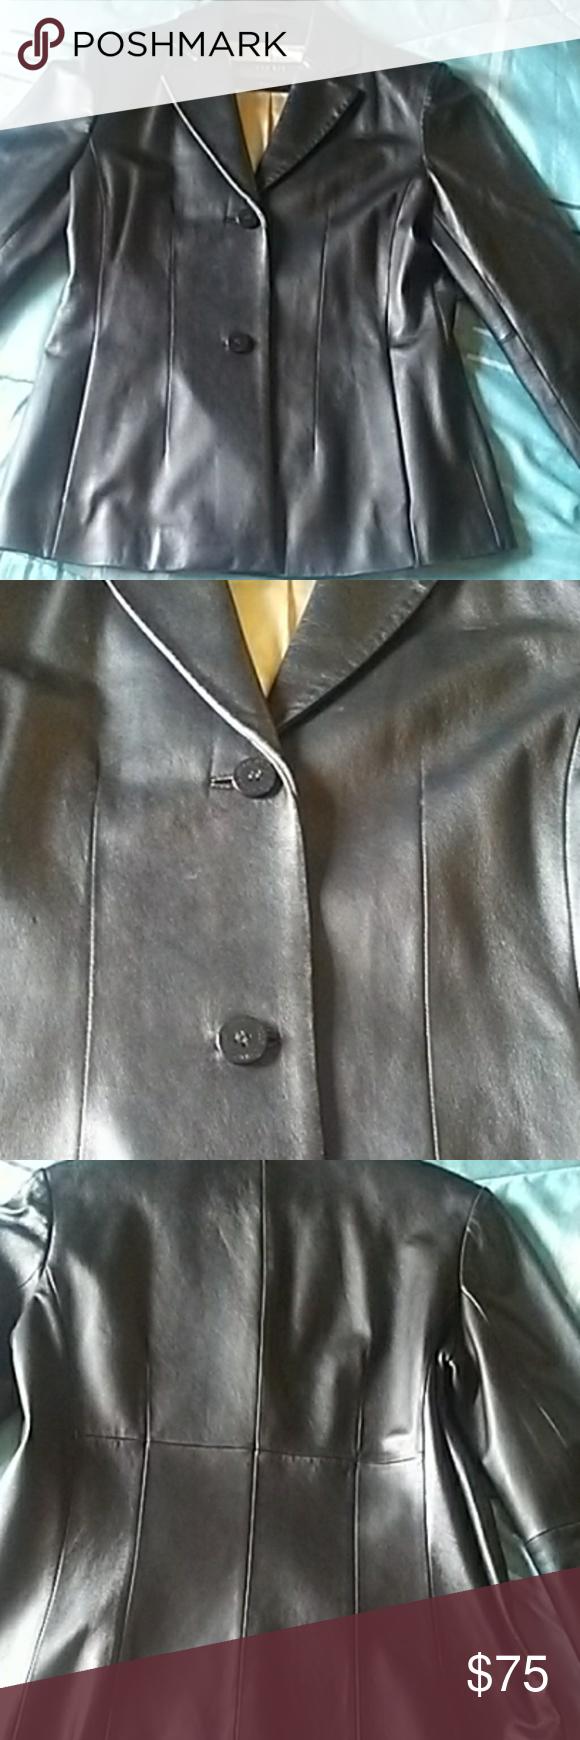 ⭐WILSON'S PELLE STUDIO Women's Leather Jacket Leather